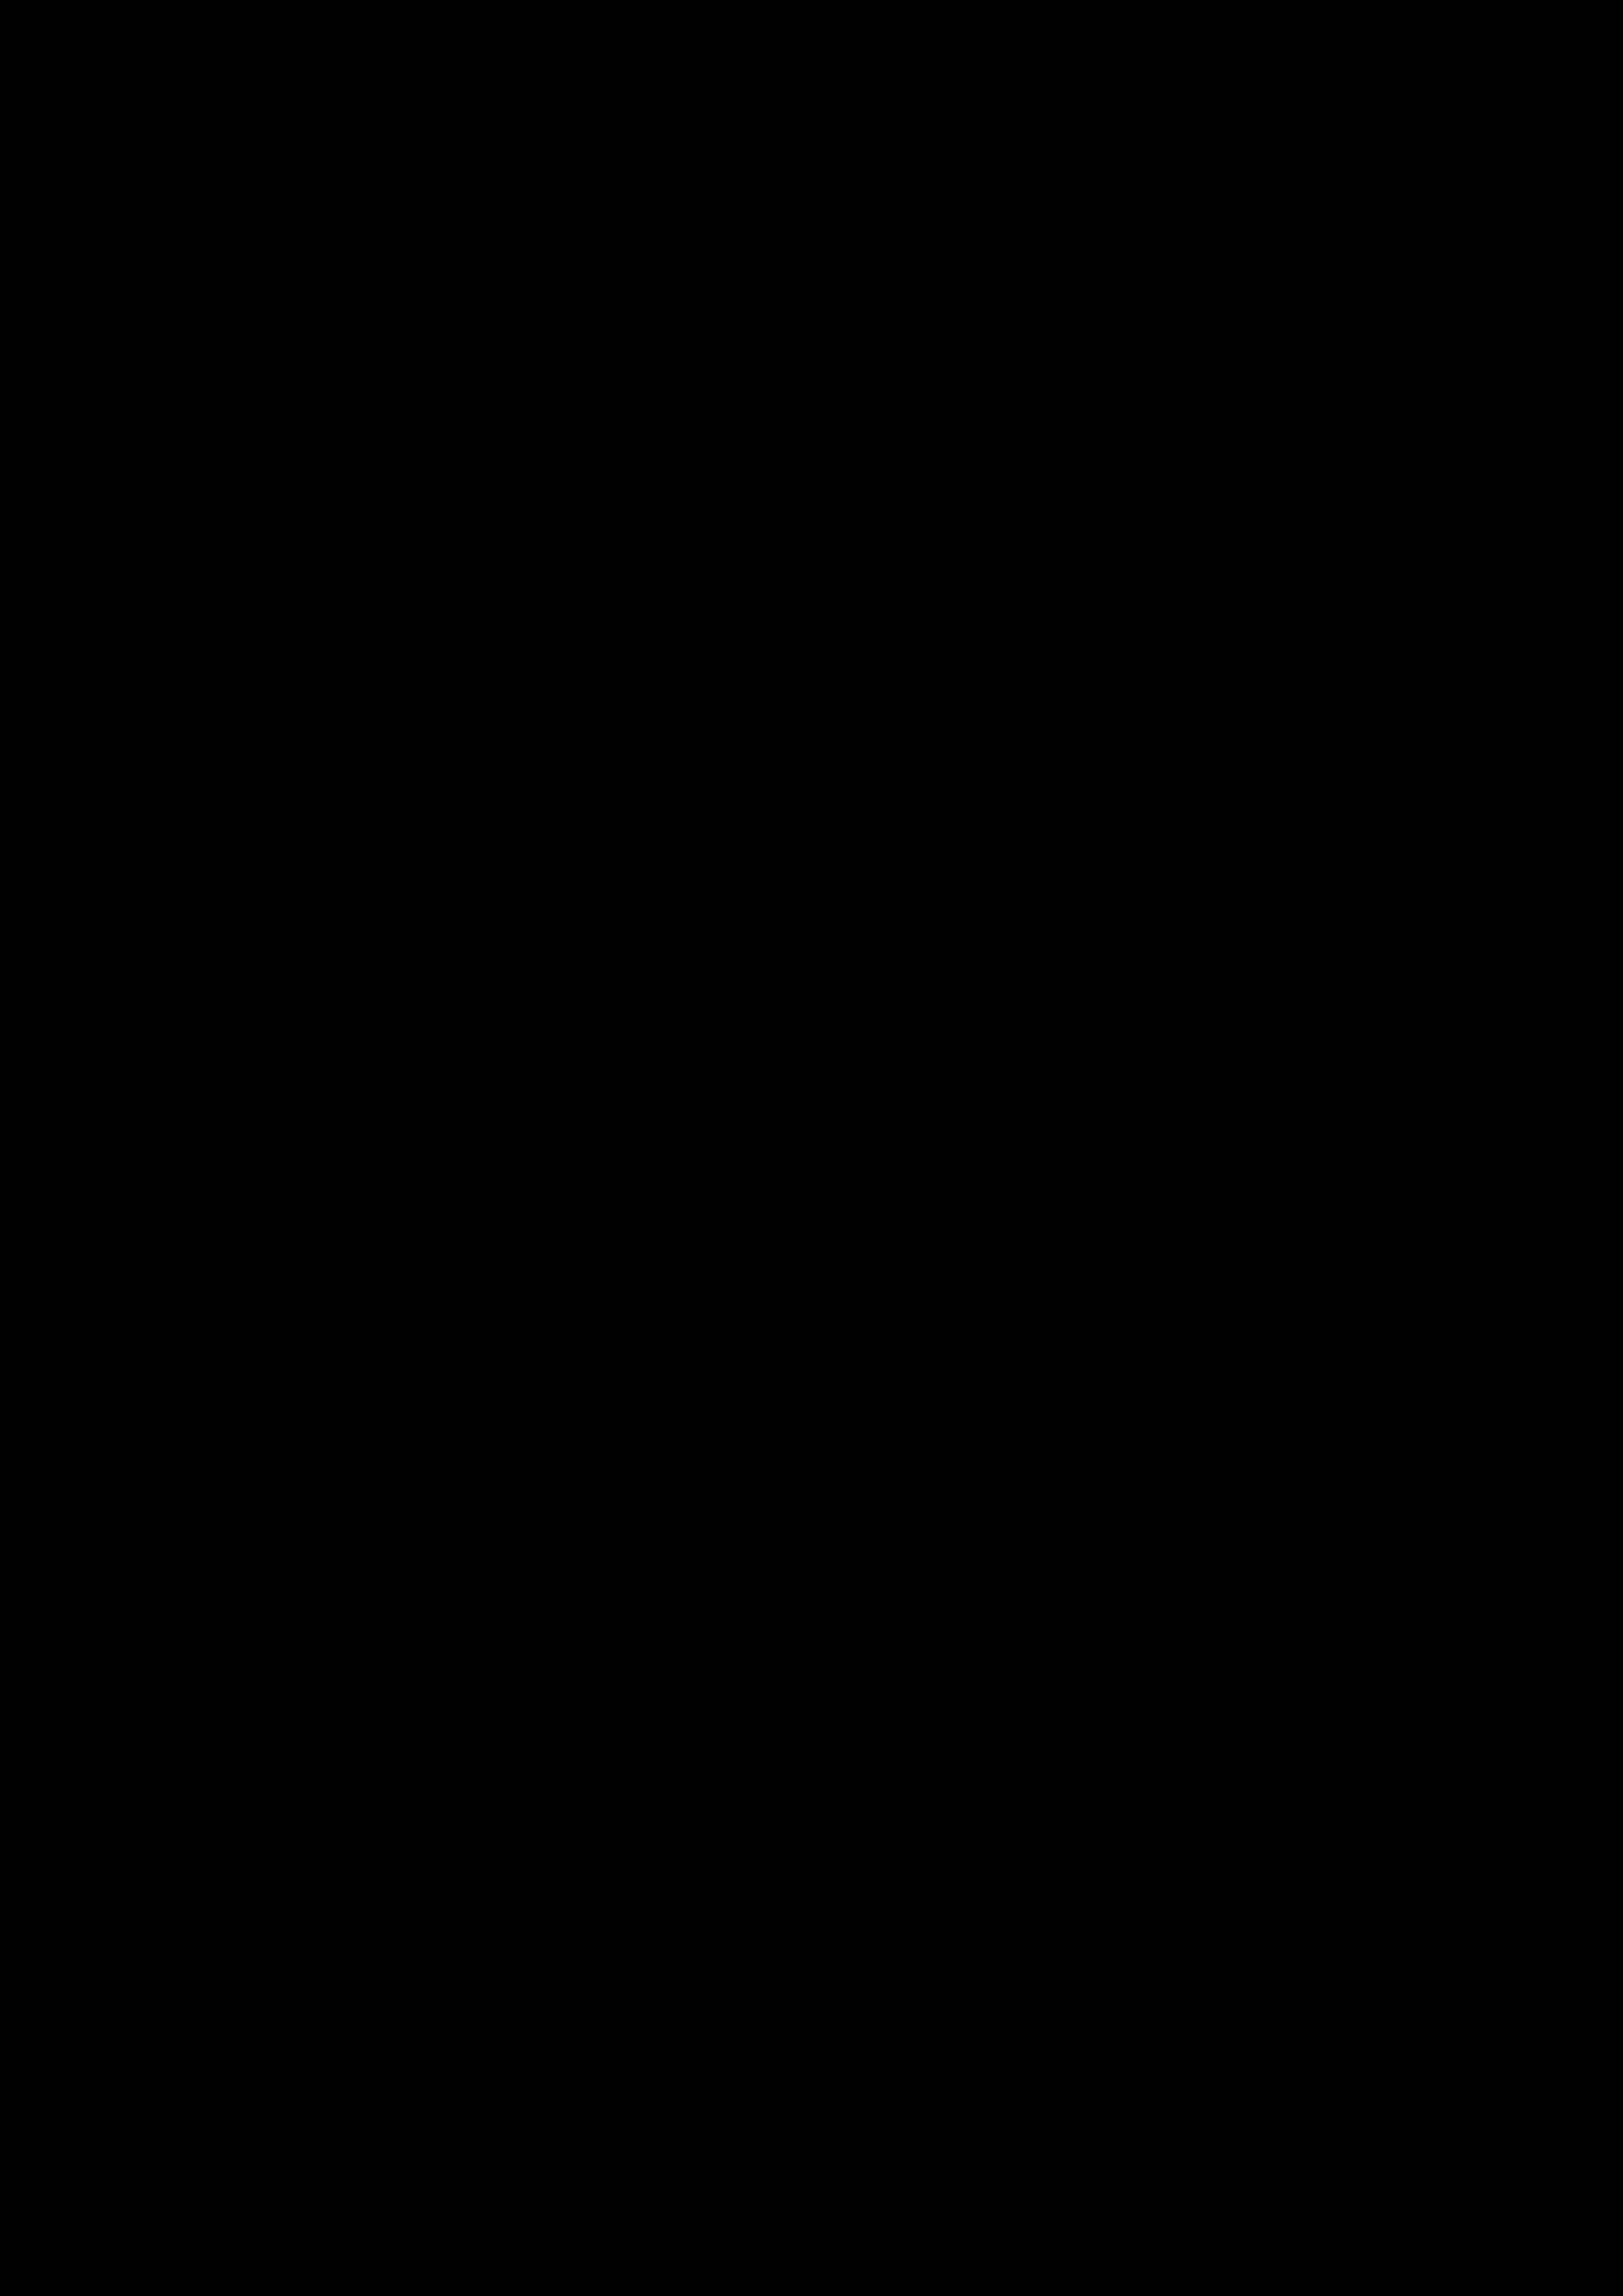 Image result for Royal canin transparent cat